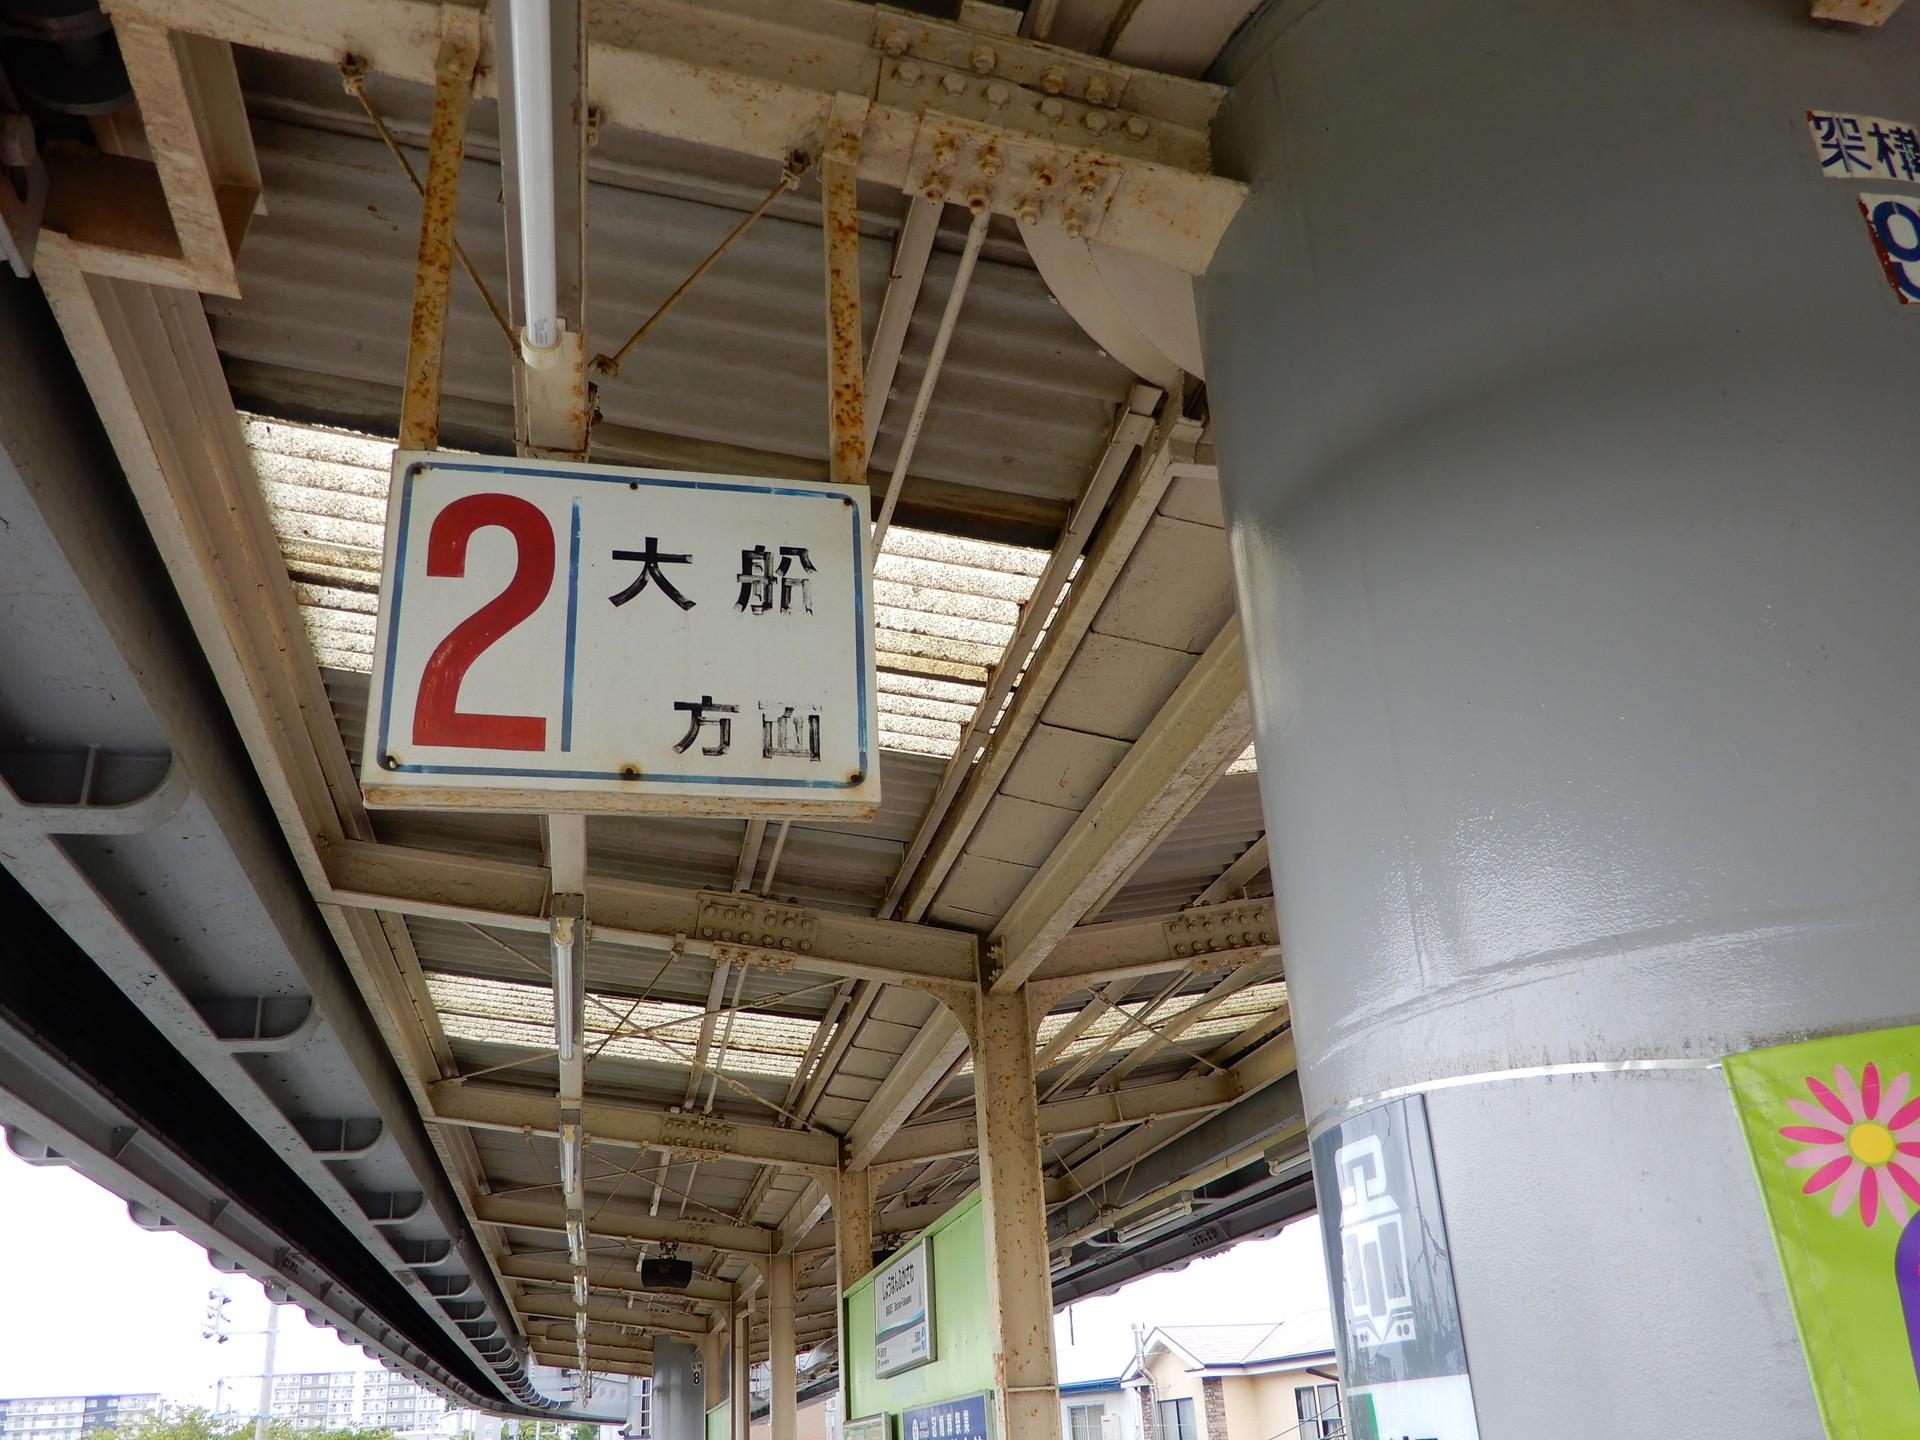 湘南深沢駅の番線表示